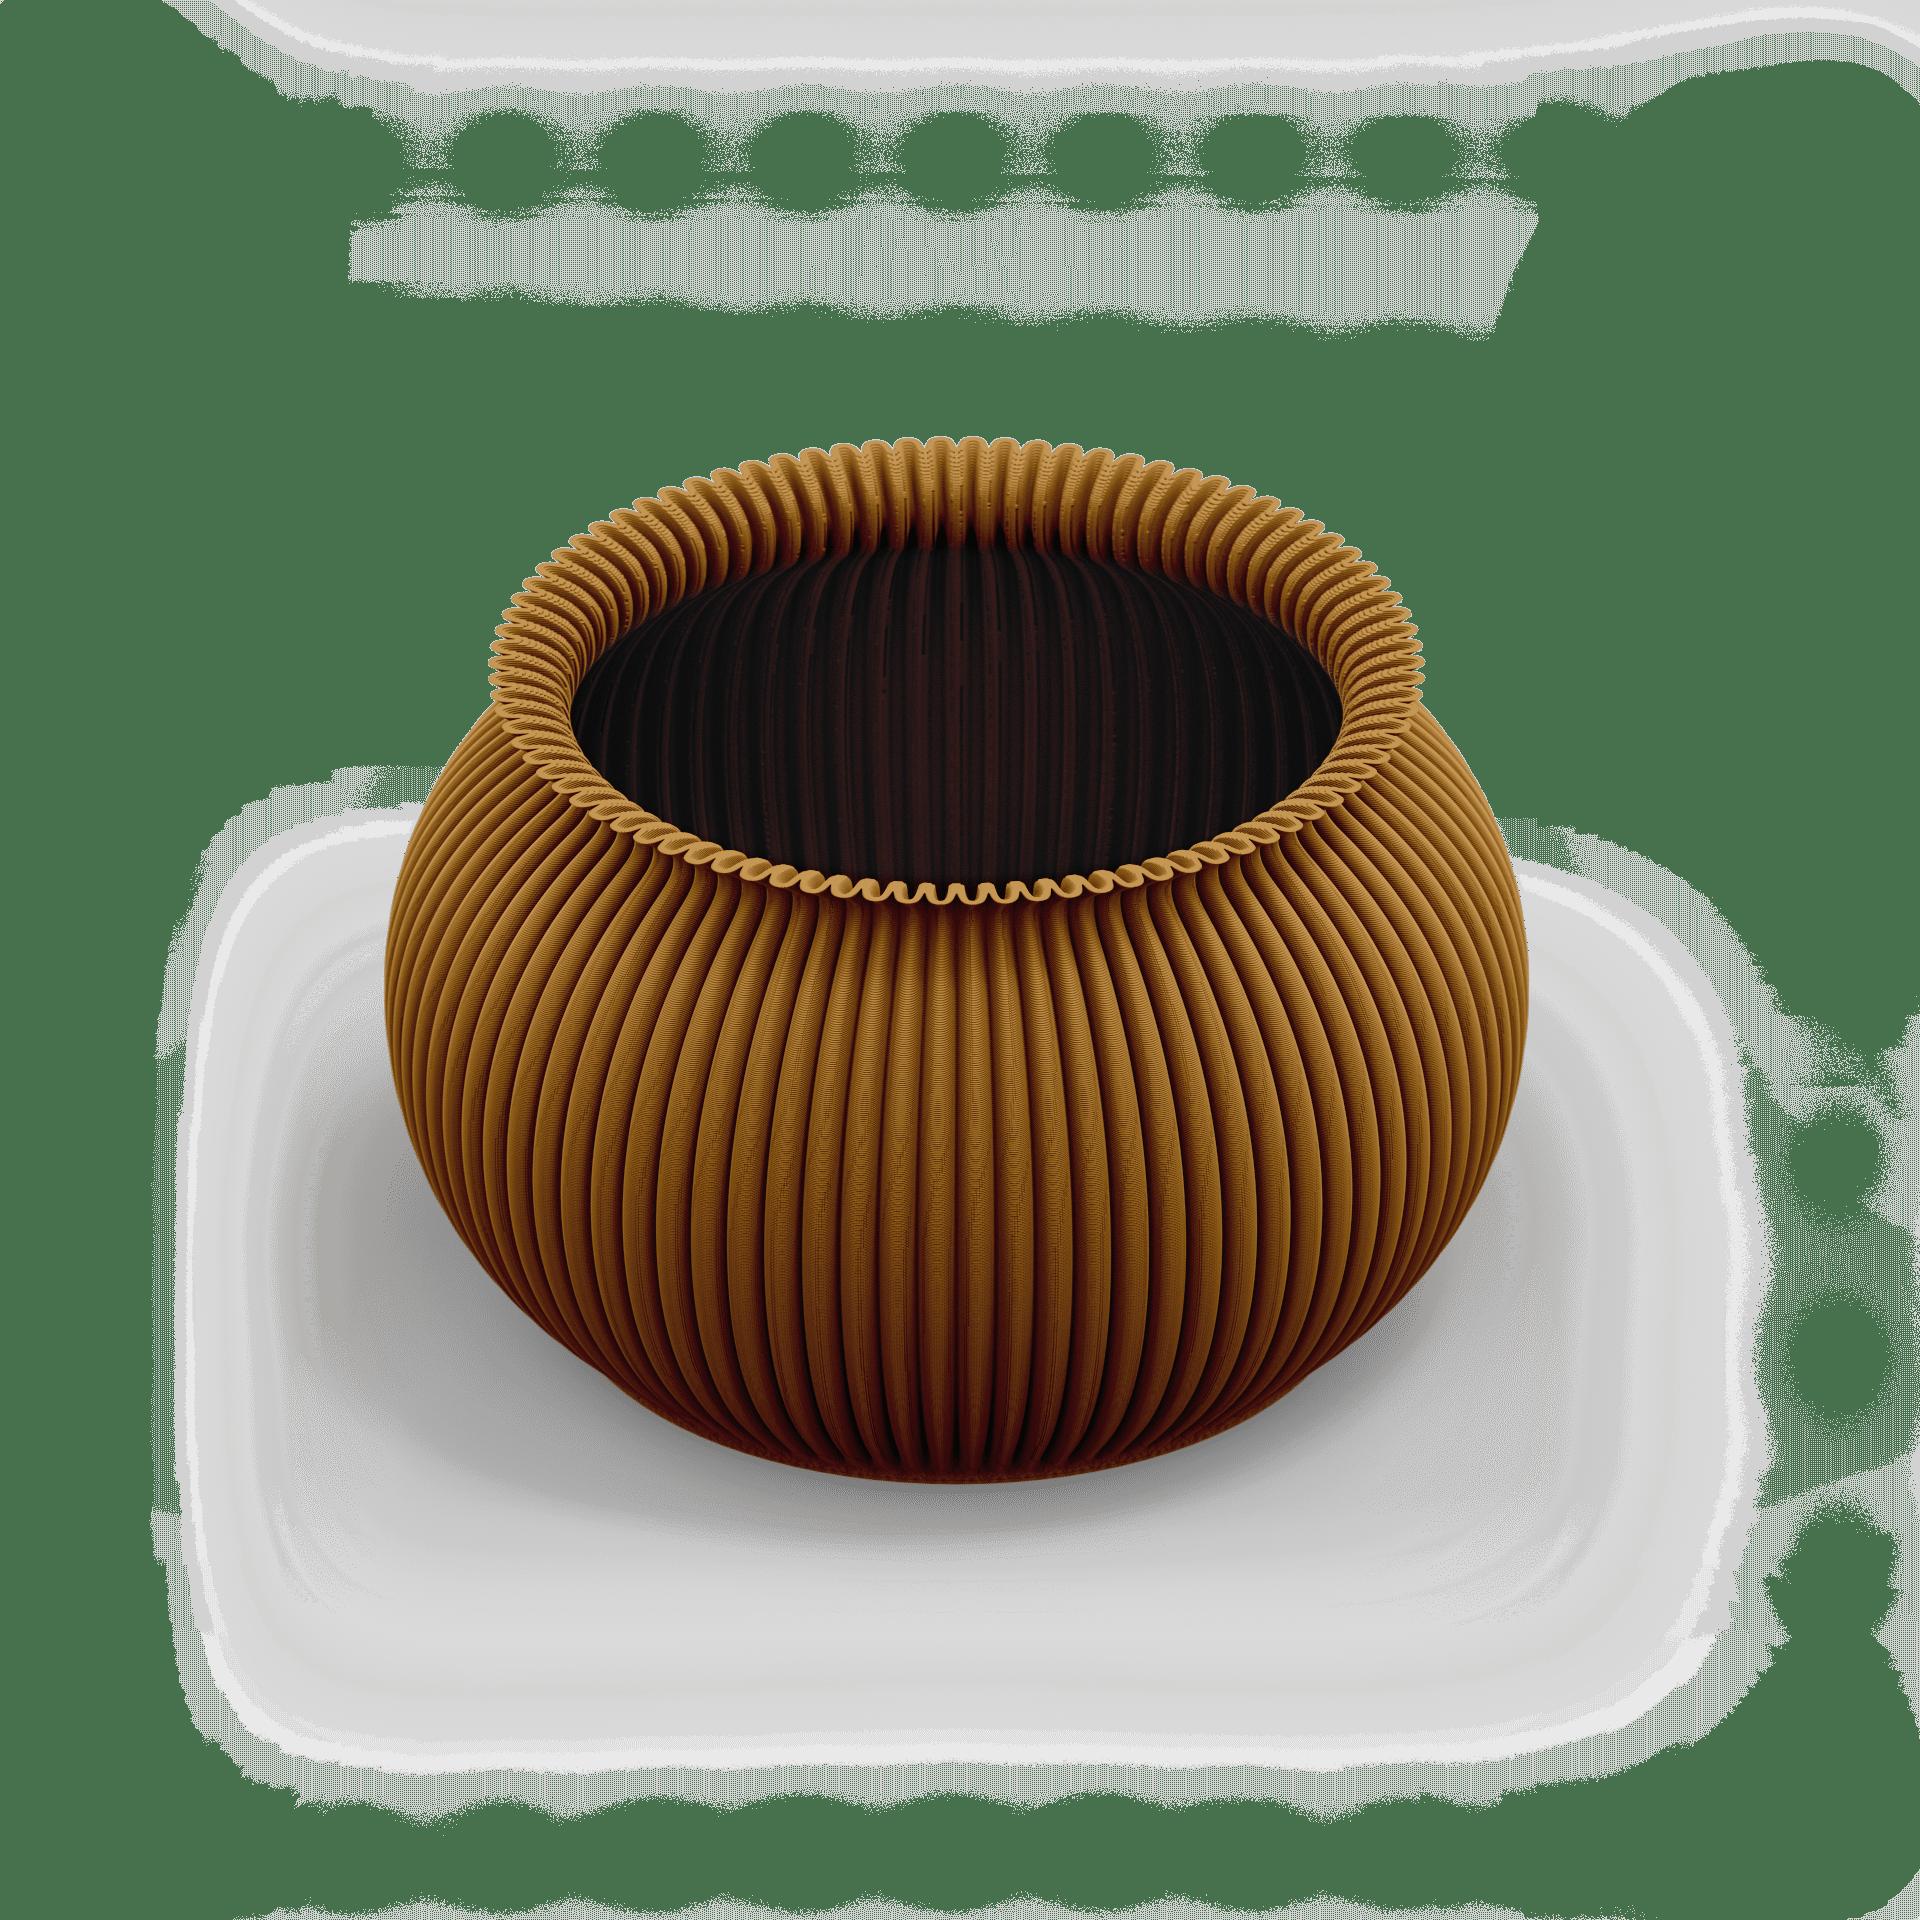 Zayl 126g Bowl Cinnamon